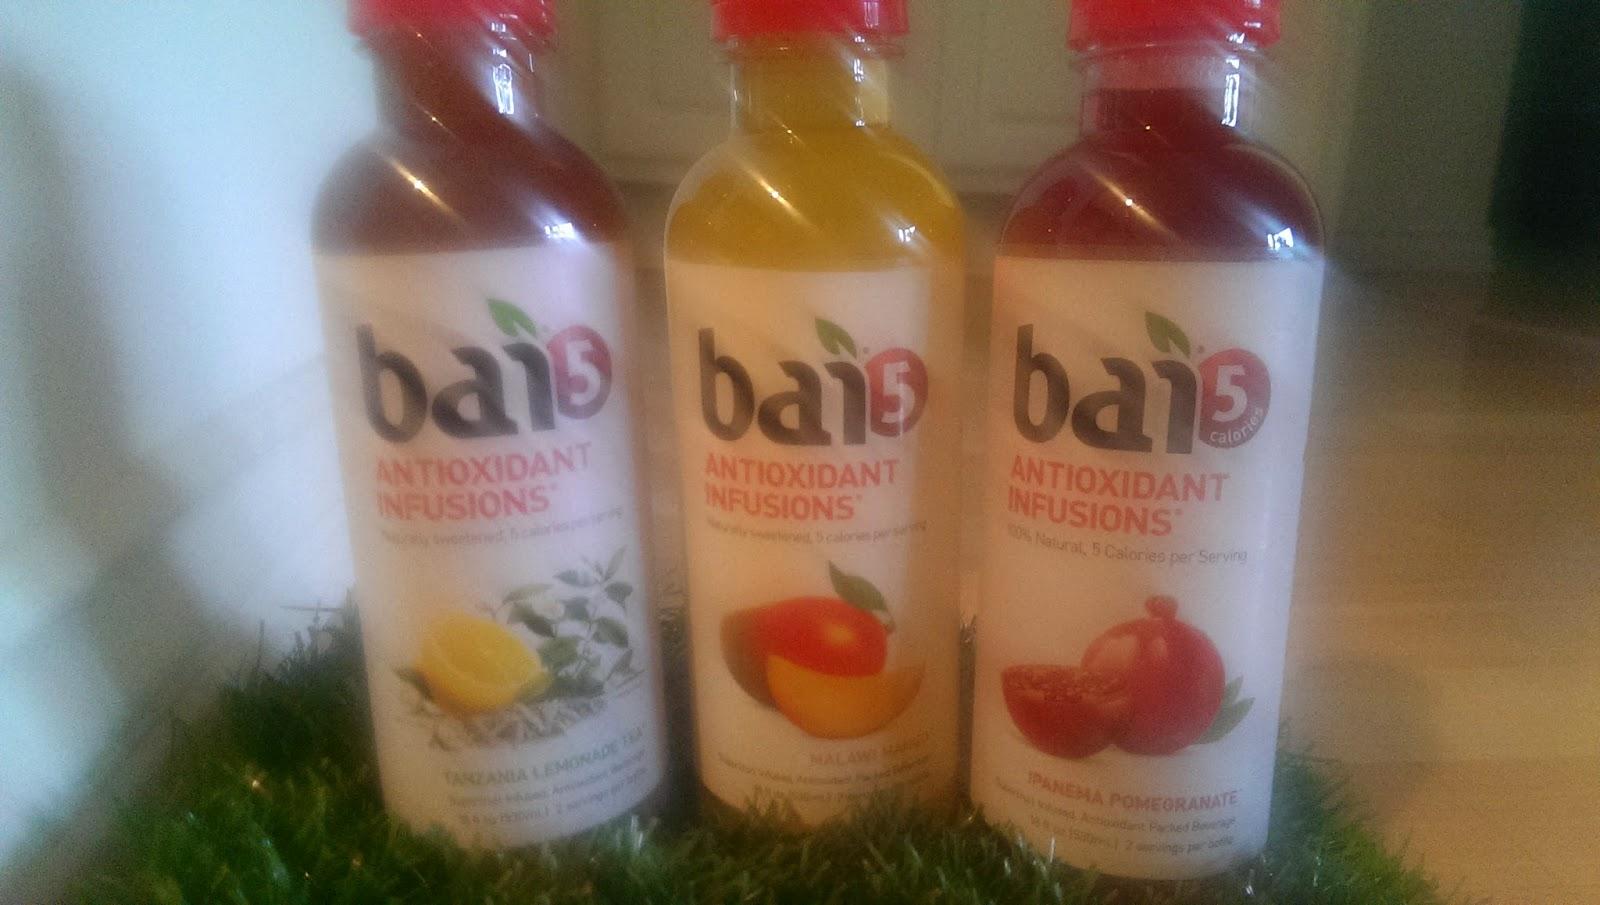 Bai+5 Bai5 Drink Review- Antioxidant Diet